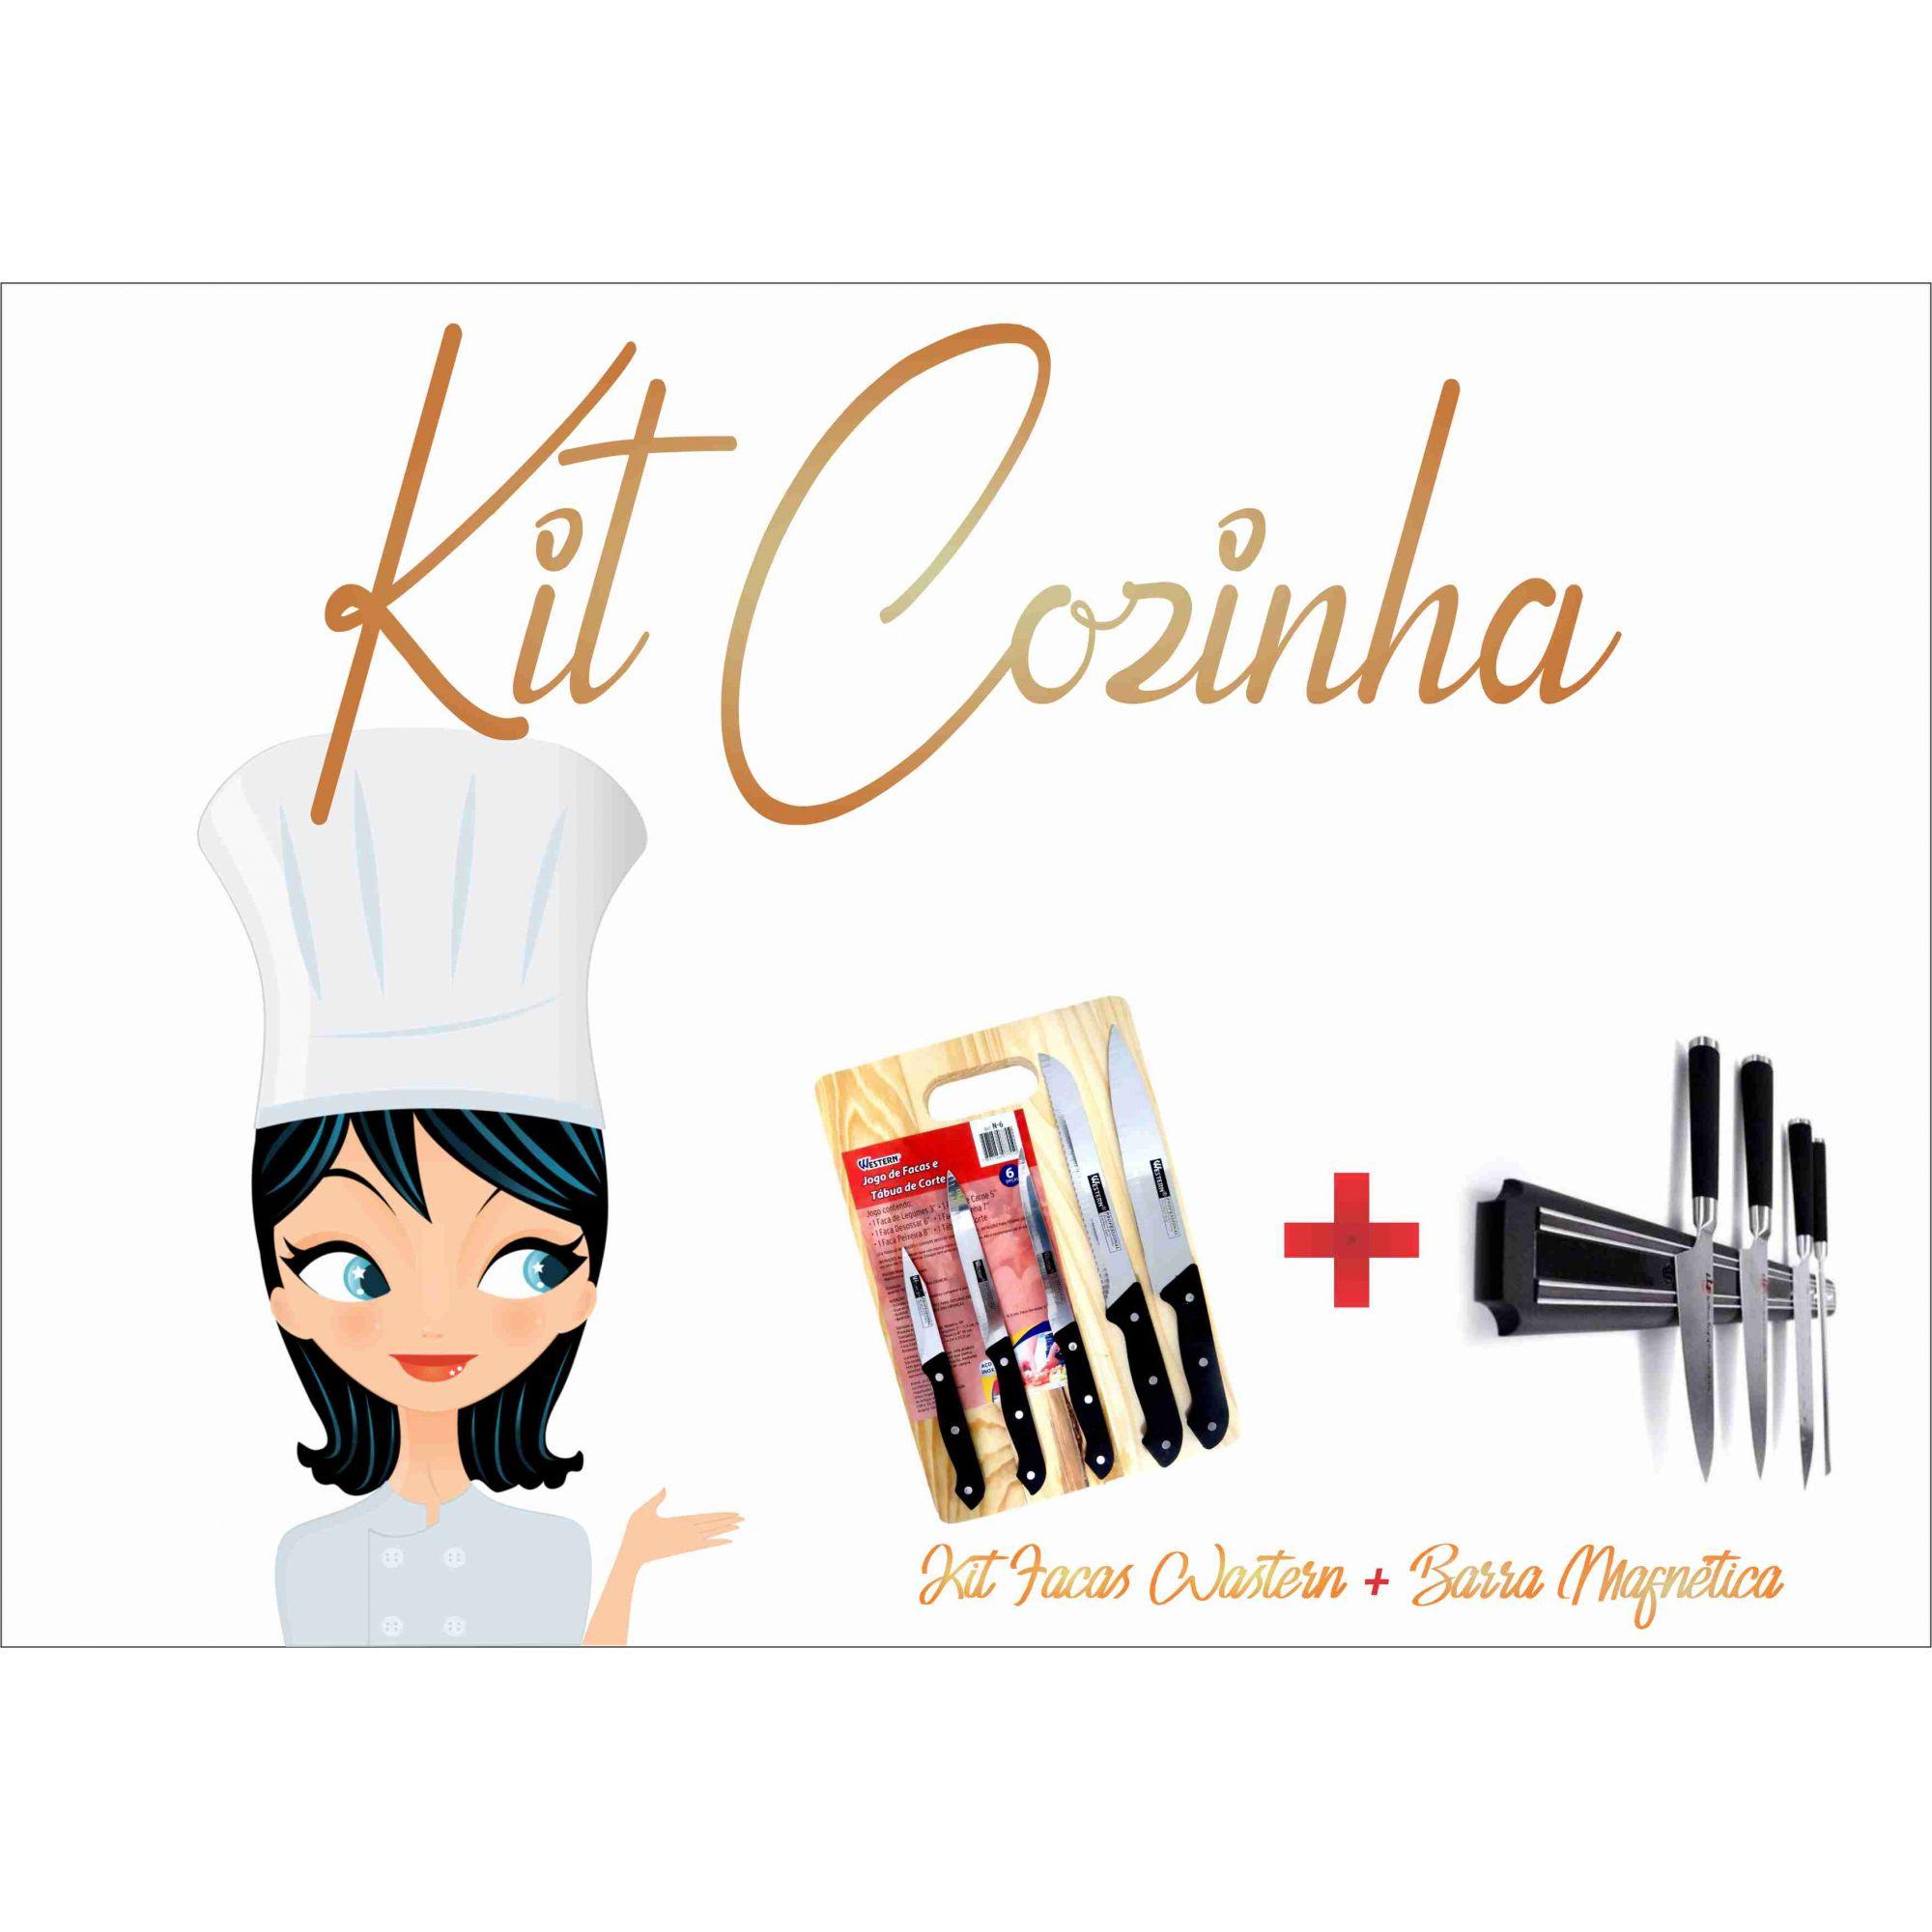 Kit 5 Facas C/Tabua para Cortes + Barra Magnética  - Rea Comércio - Sua Loja Completa!